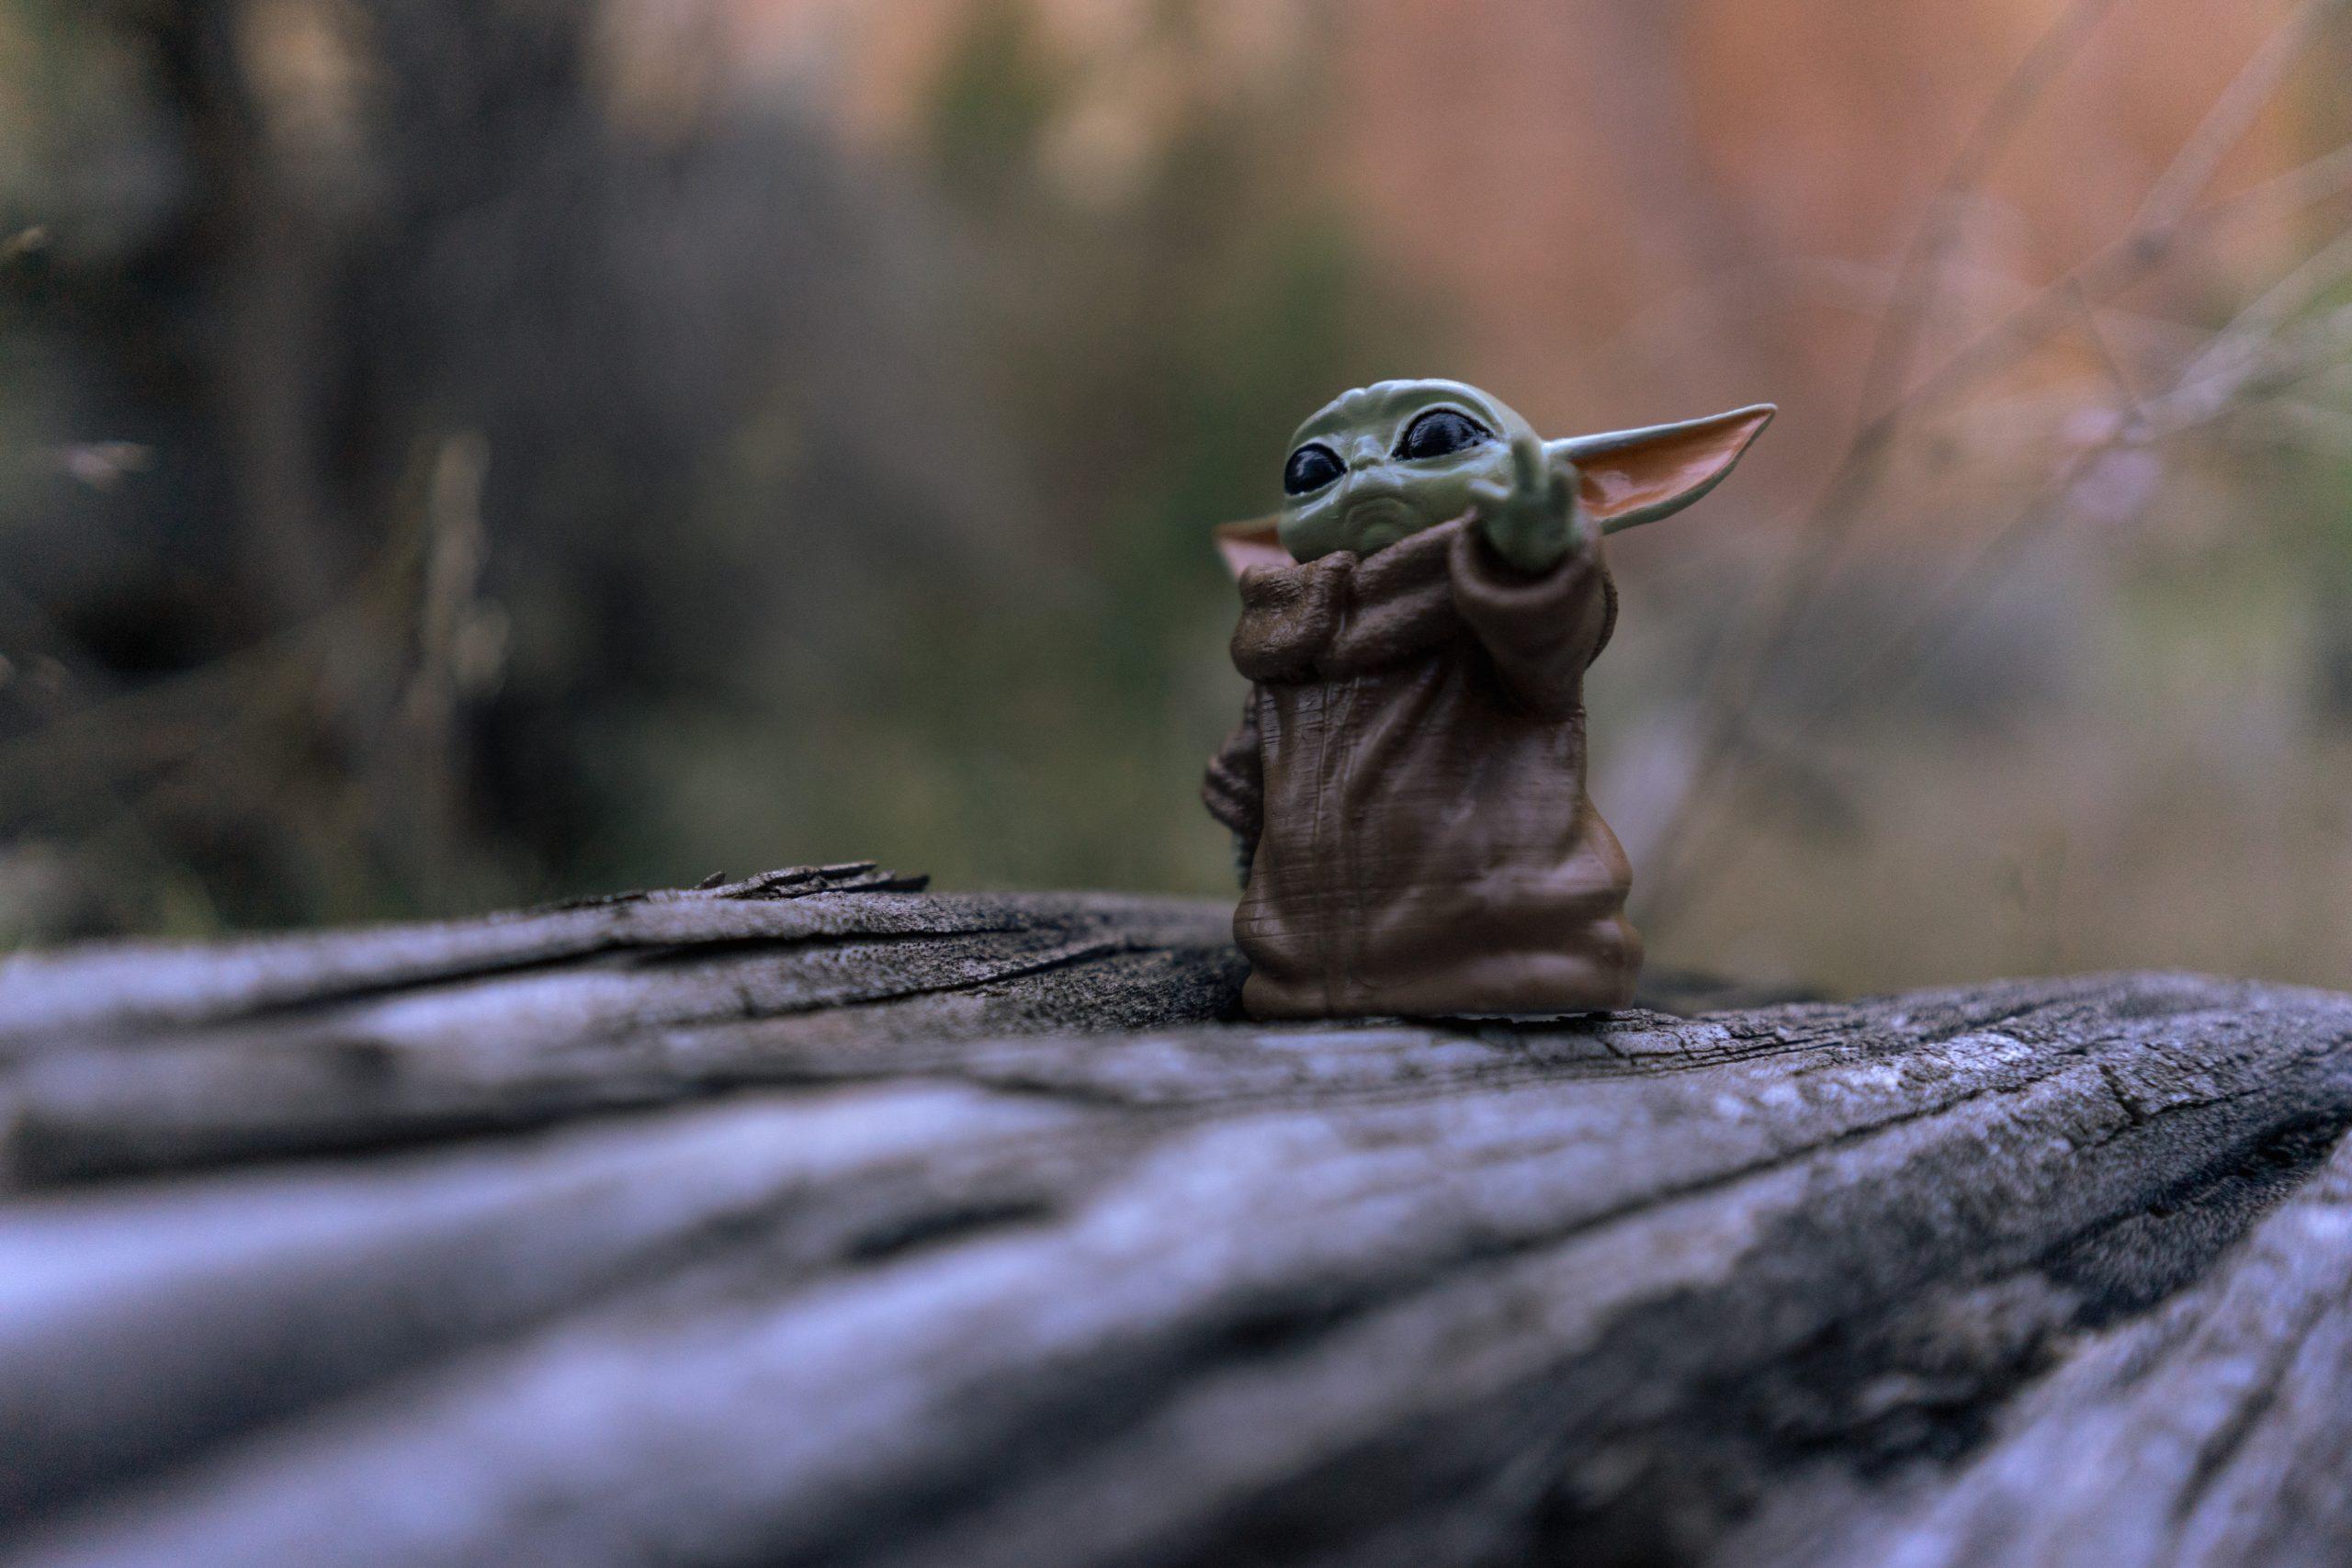 Maître Yoda figurine